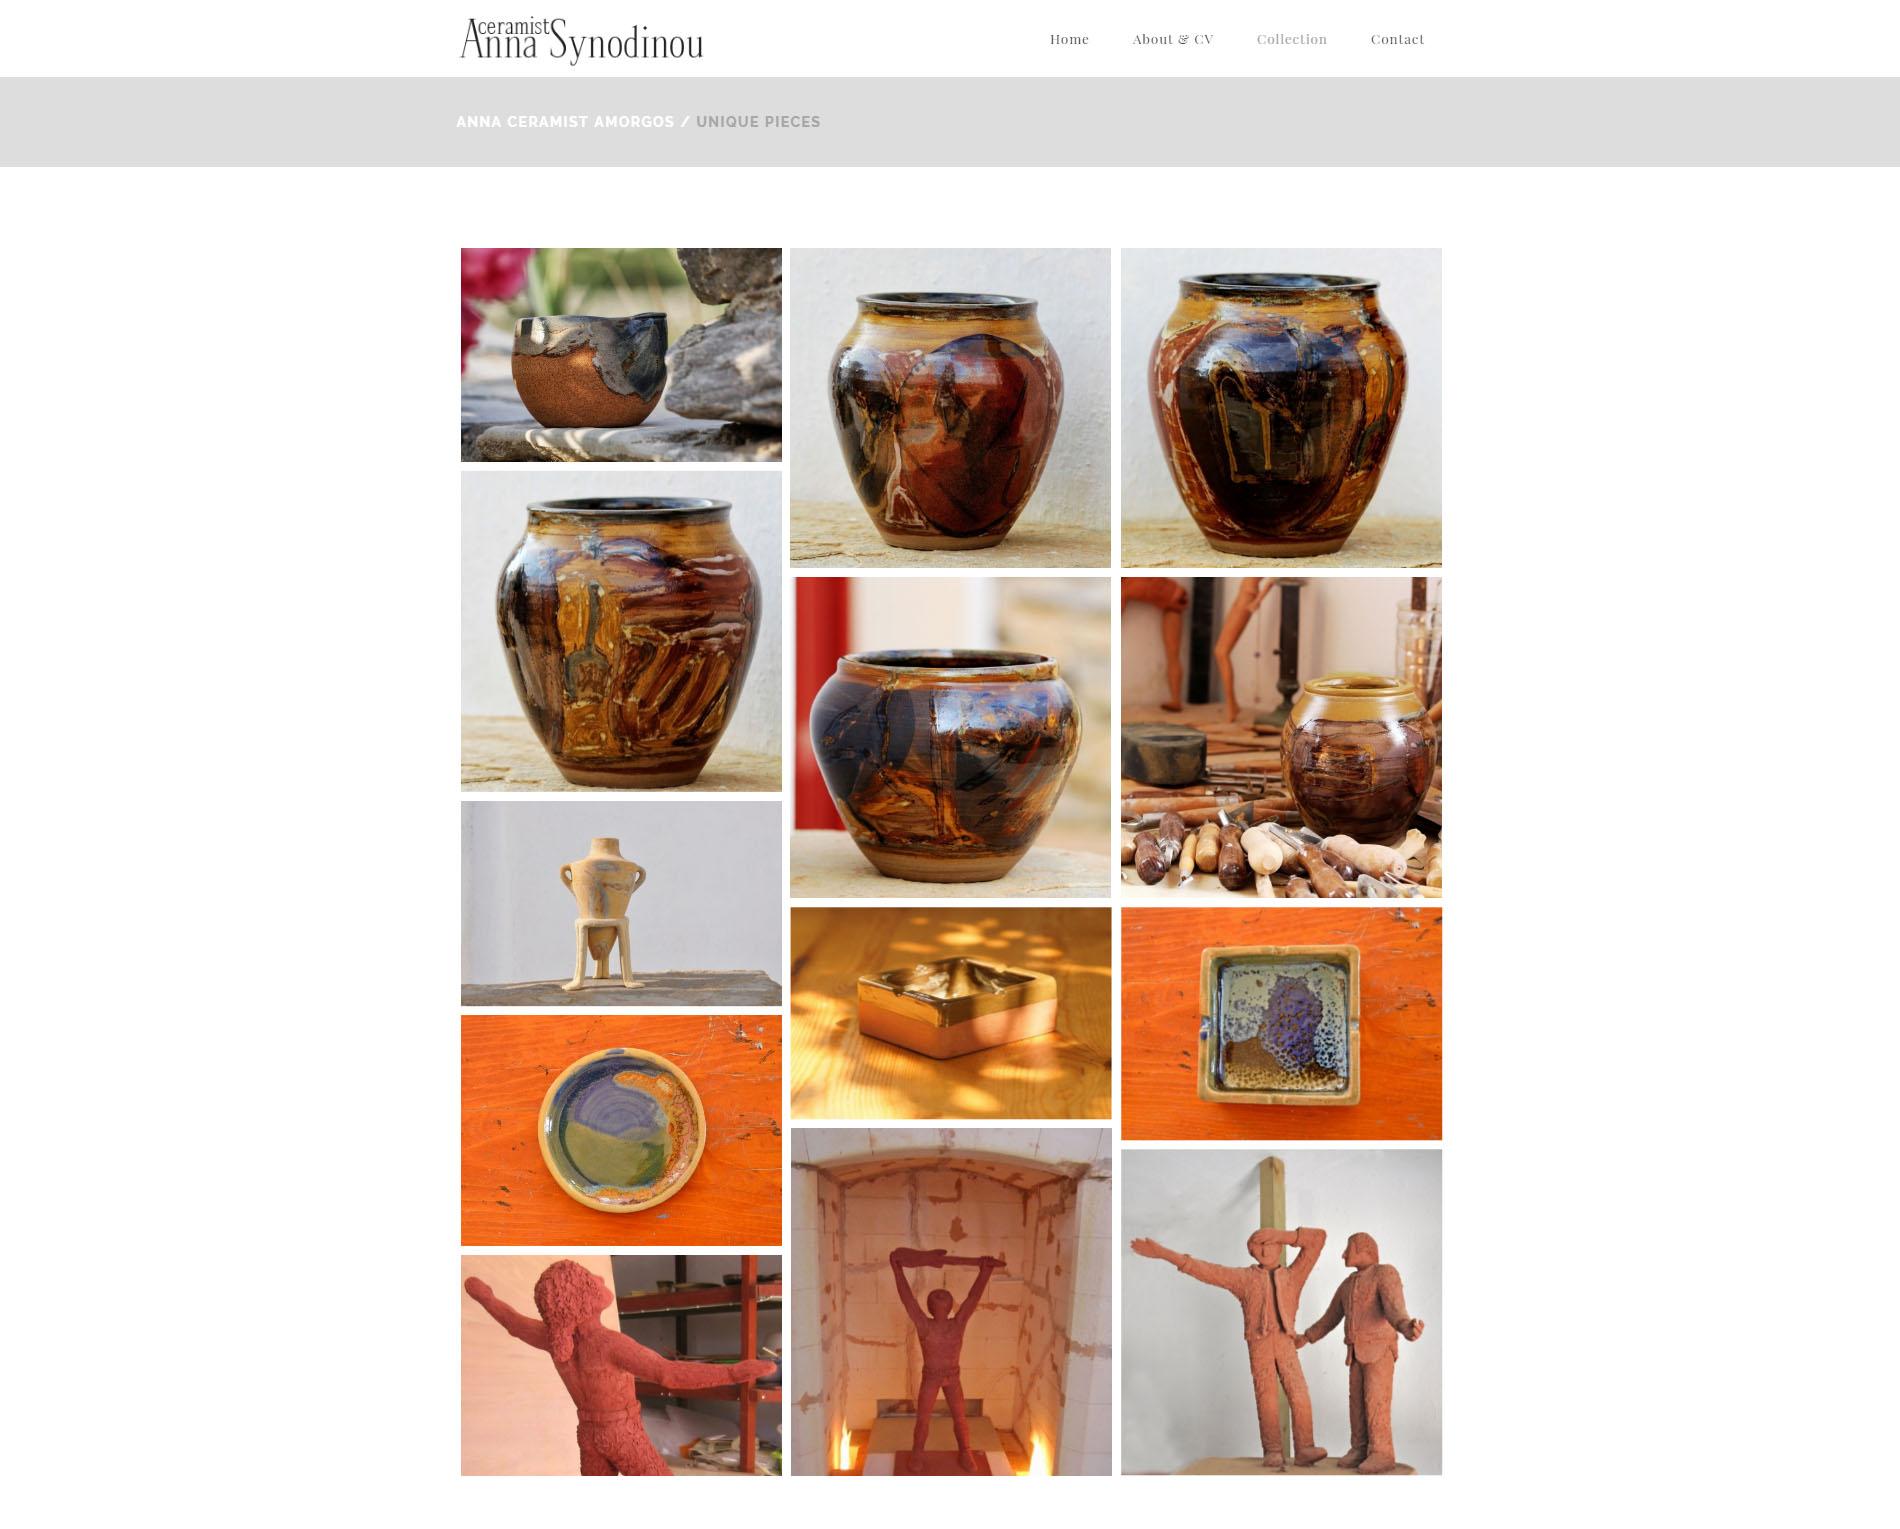 Website anweb Anna Ceramist